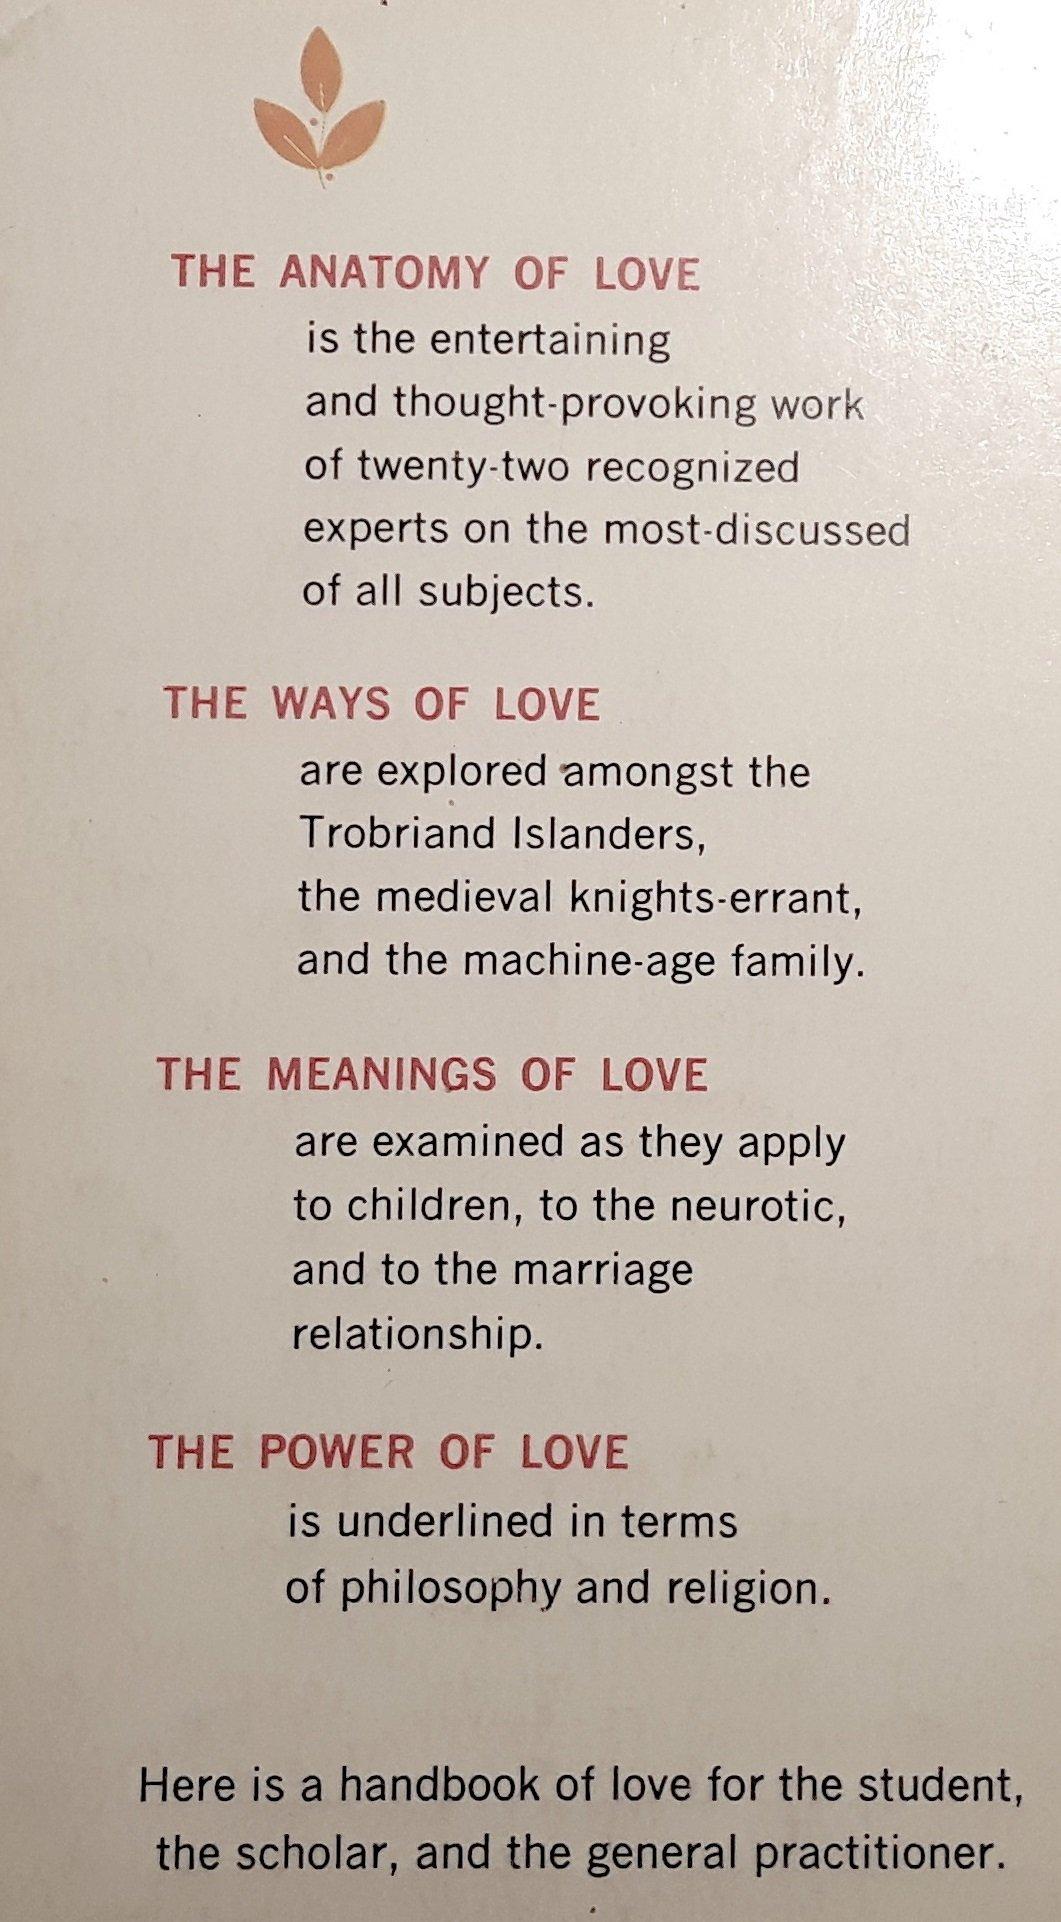 THE ANATOMY OF LOVE: A. M. (editor) Krich: Books - Amazon.ca